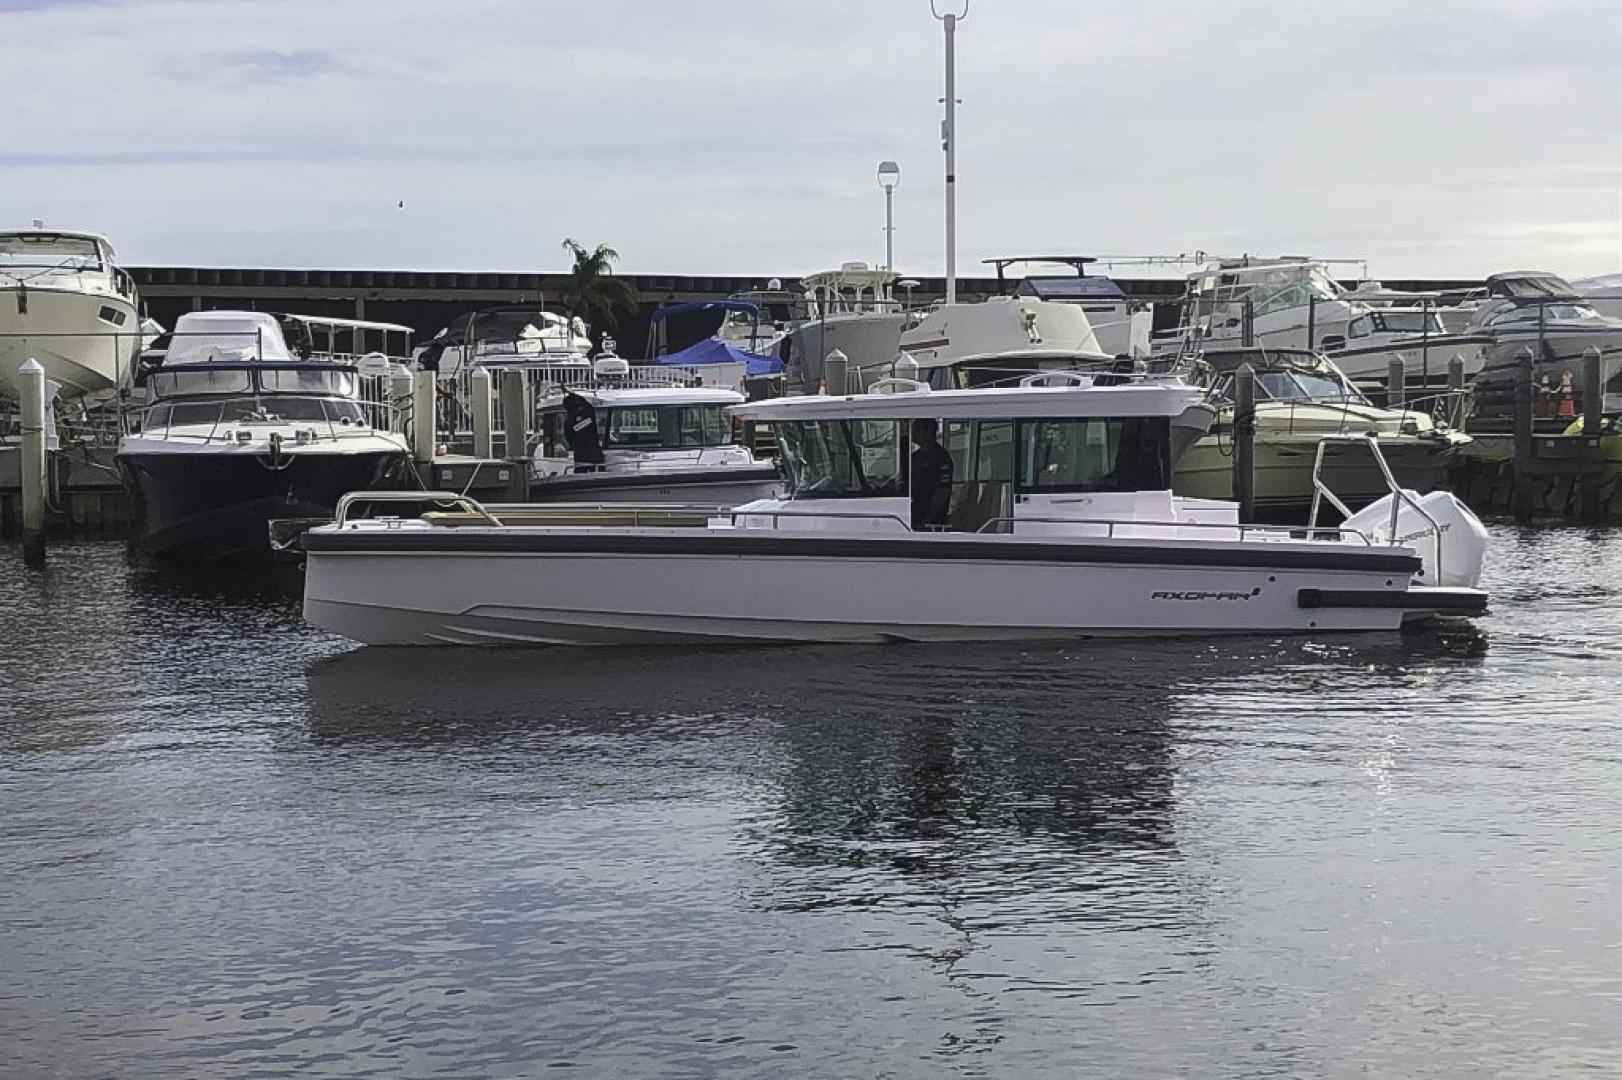 Axopar-28 CABIN 2020-Axopar 28 CABIN Fort Lauderdale-Florida-United States-1586677 | Thumbnail